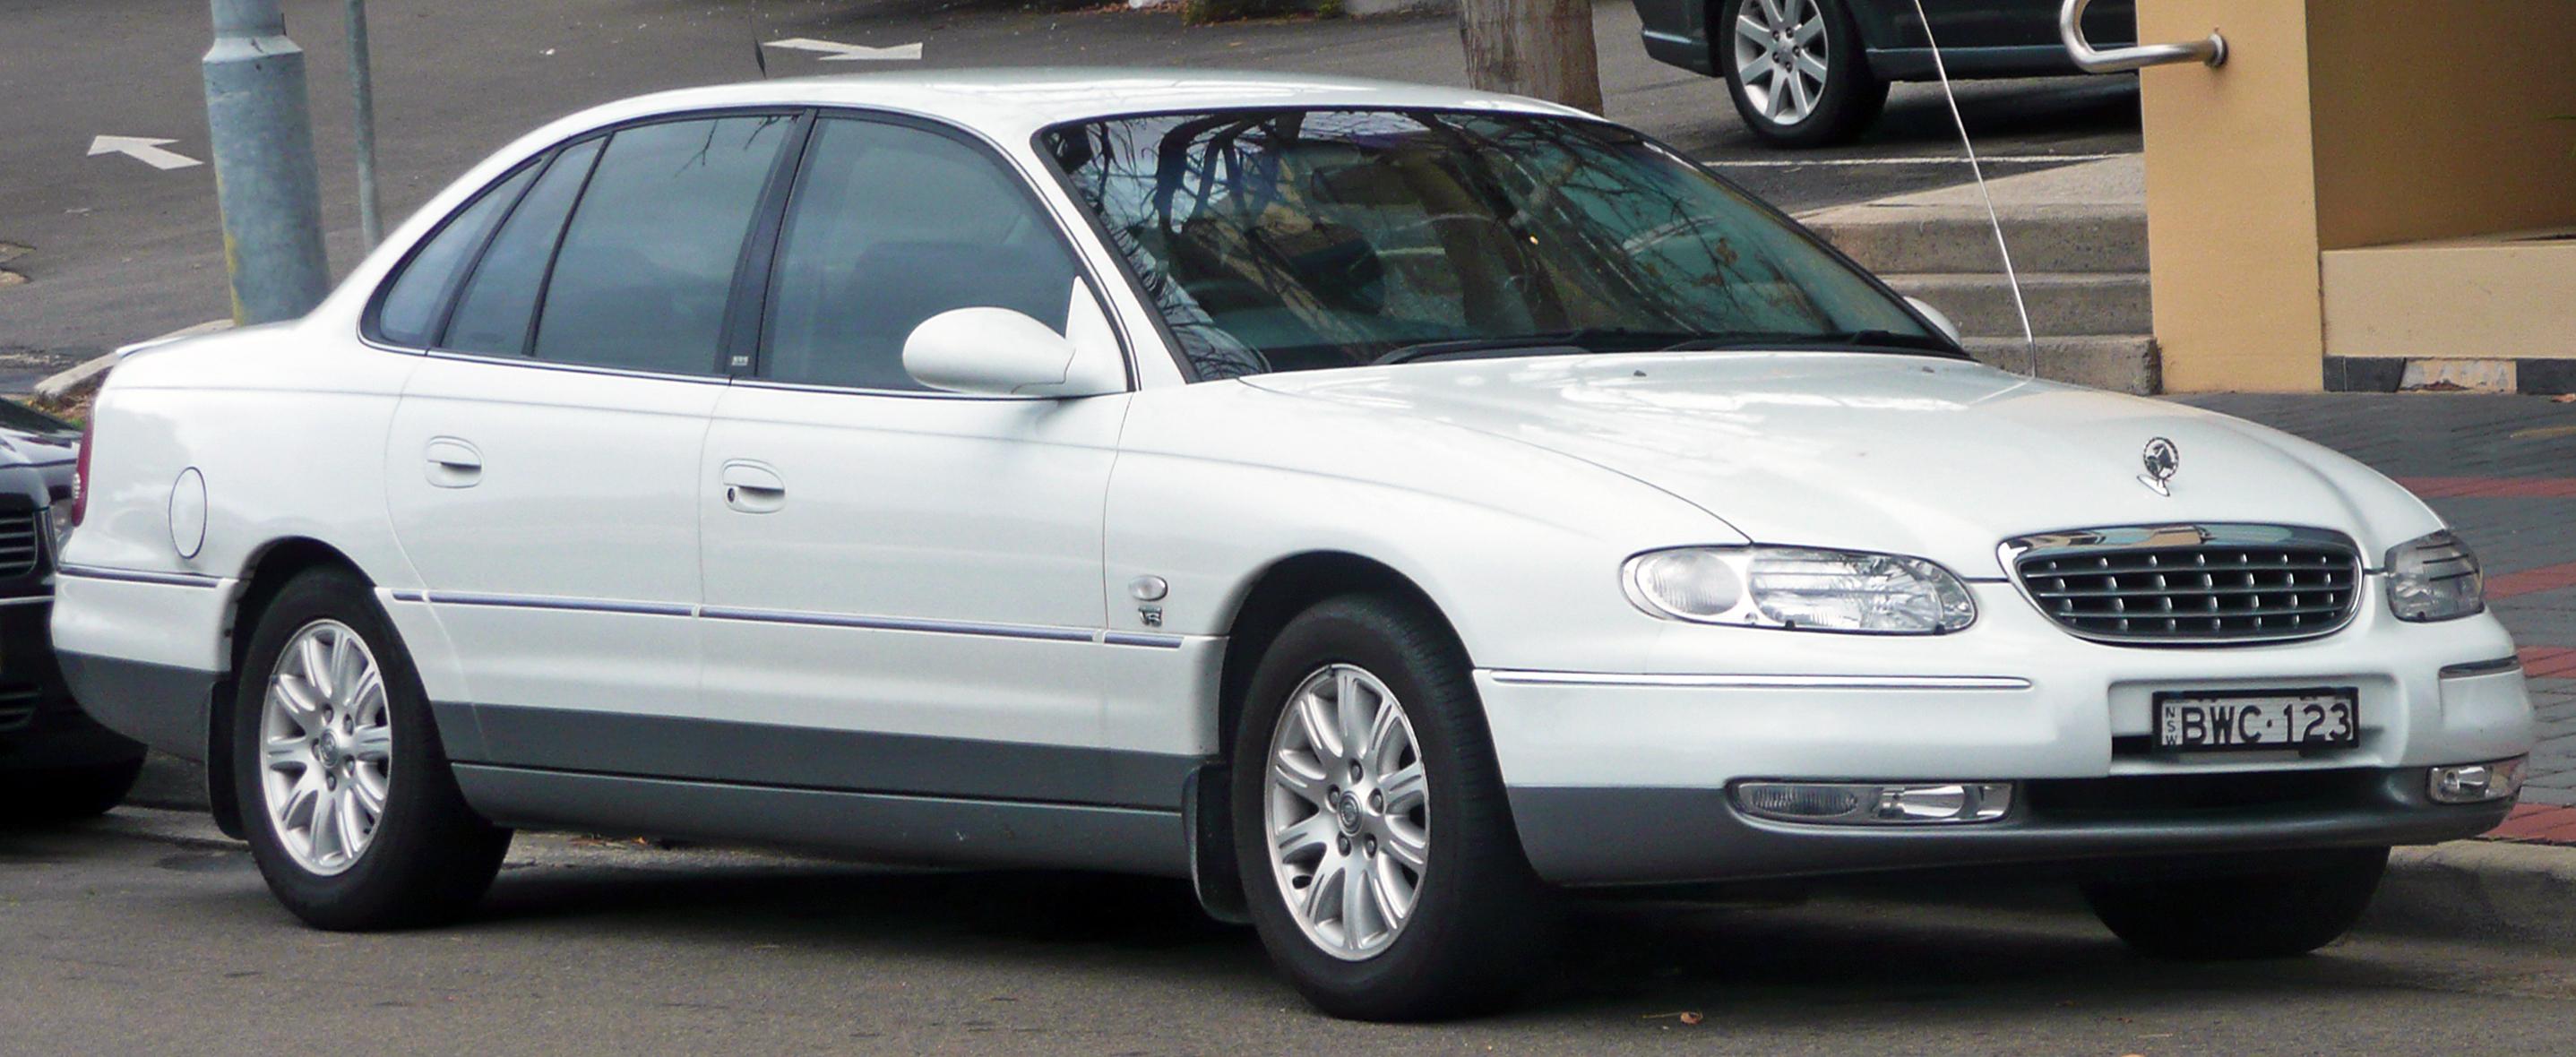 file 1999 2001 holden wh statesman sedan 03 jpg wikimedia commons rh commons wikimedia org 2001 Chevy Impala MPG 2001 Chevy Impala SS